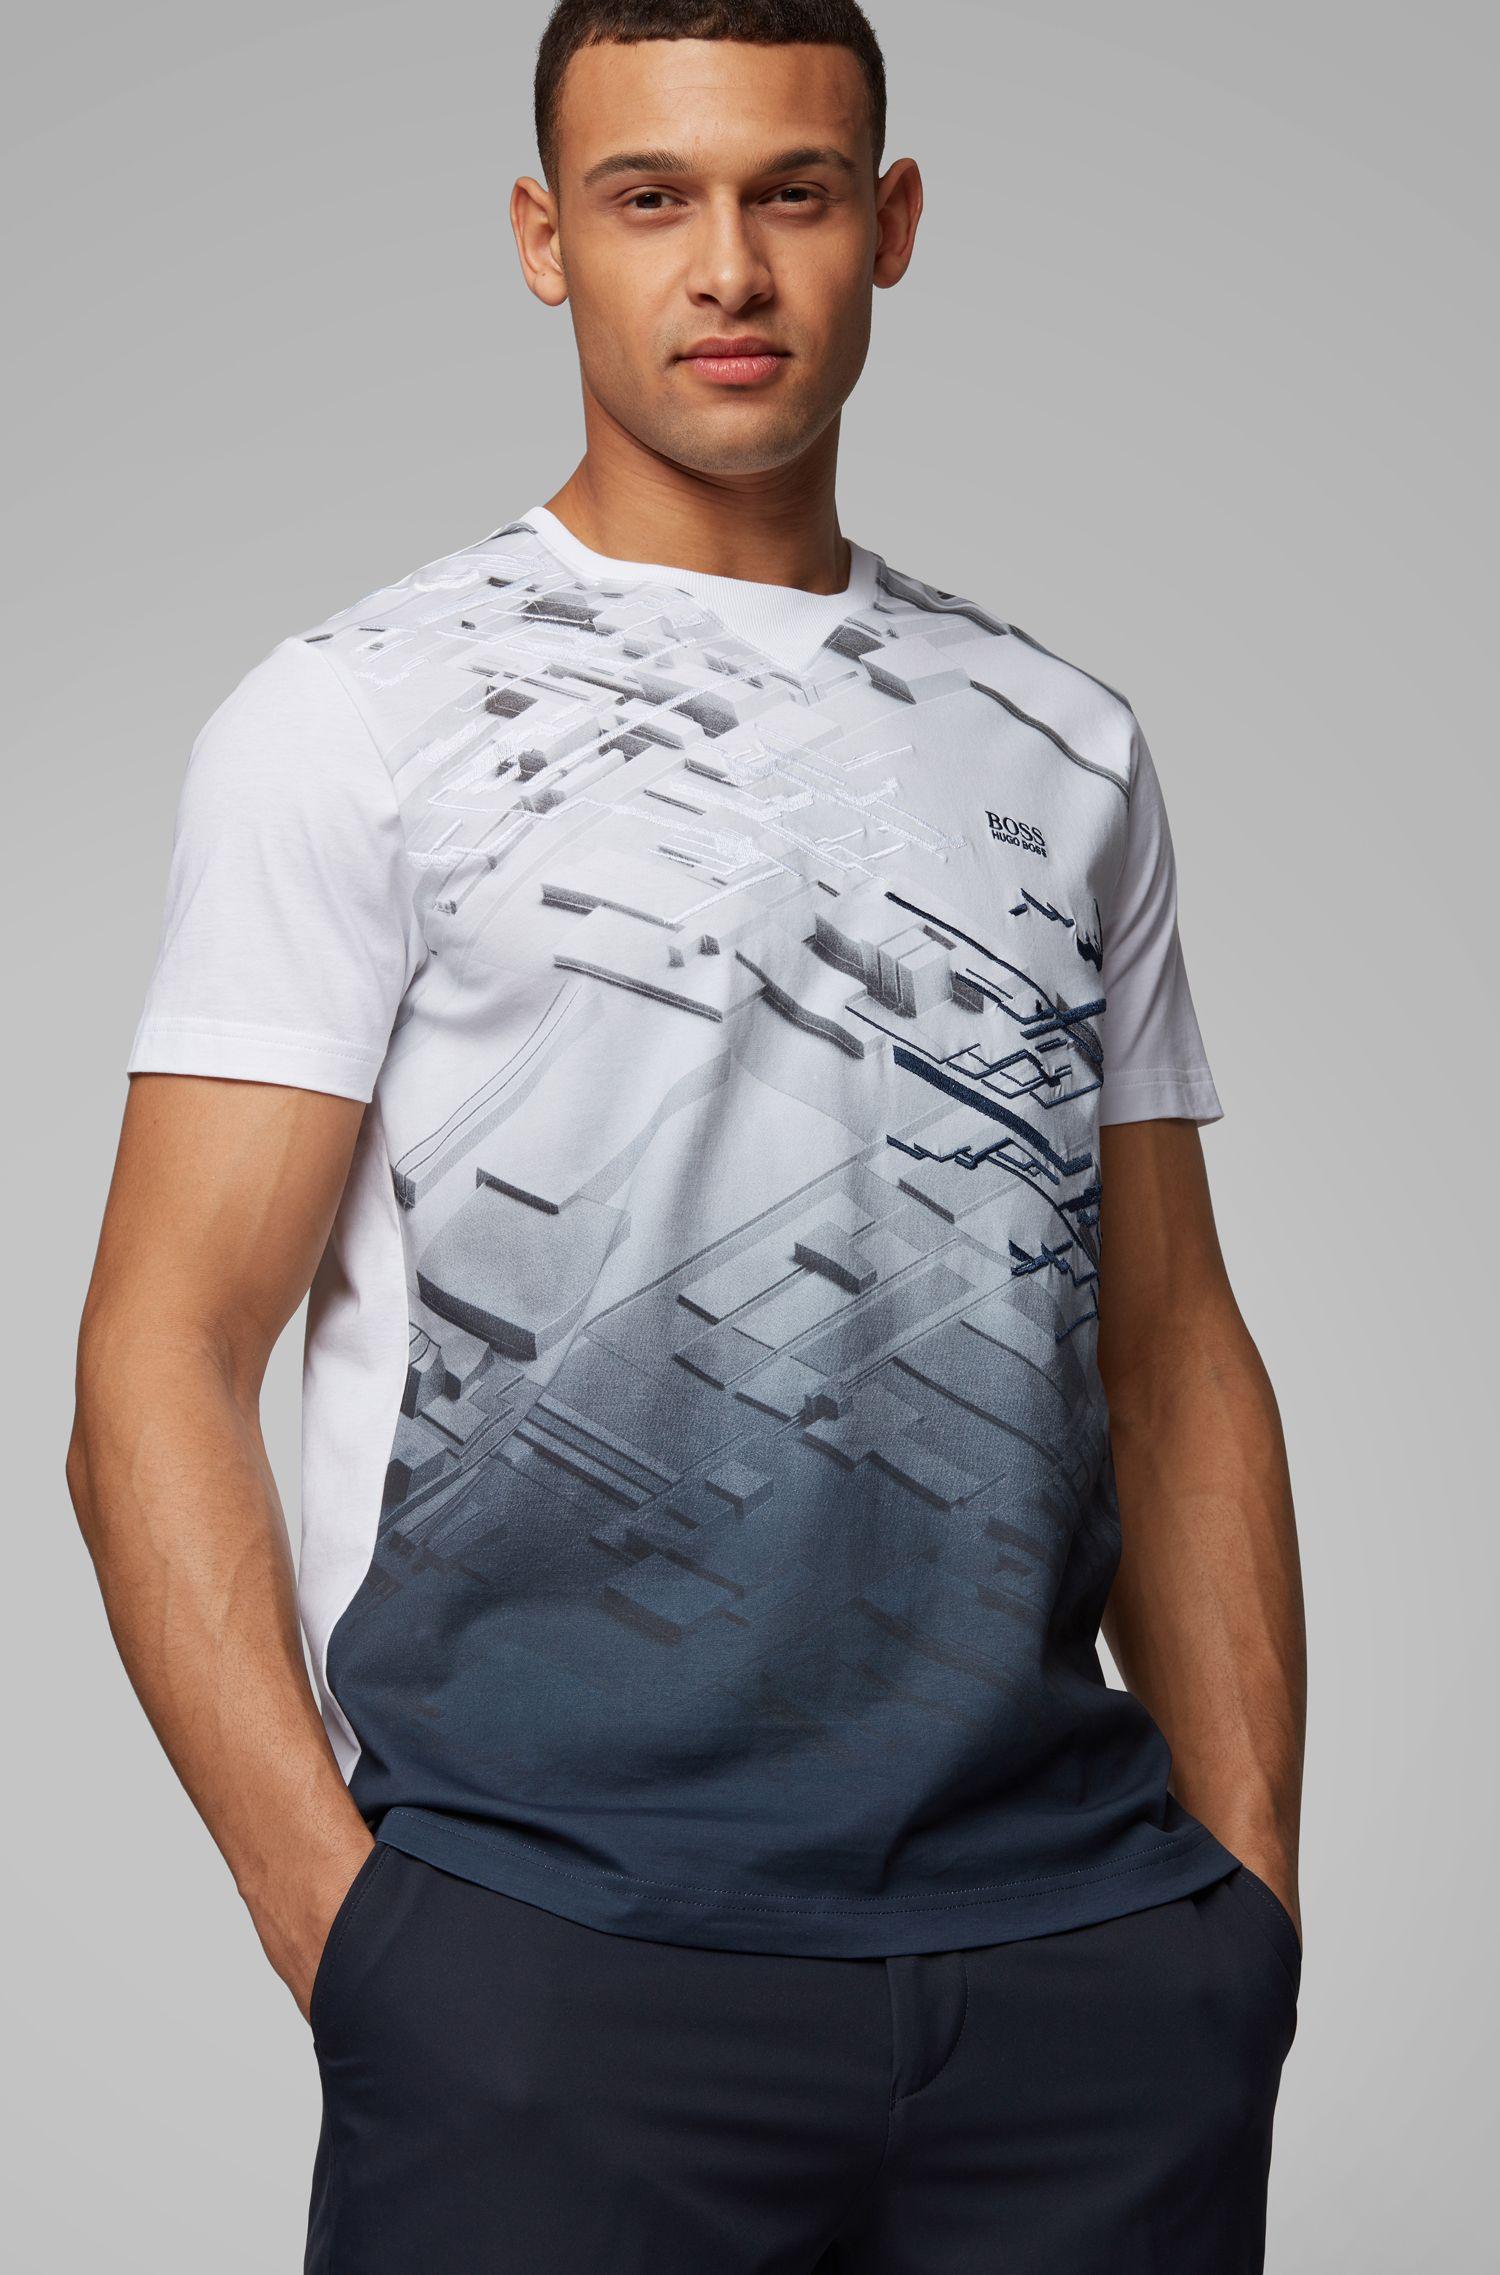 Cotton T-shirt with degradé artwork, White